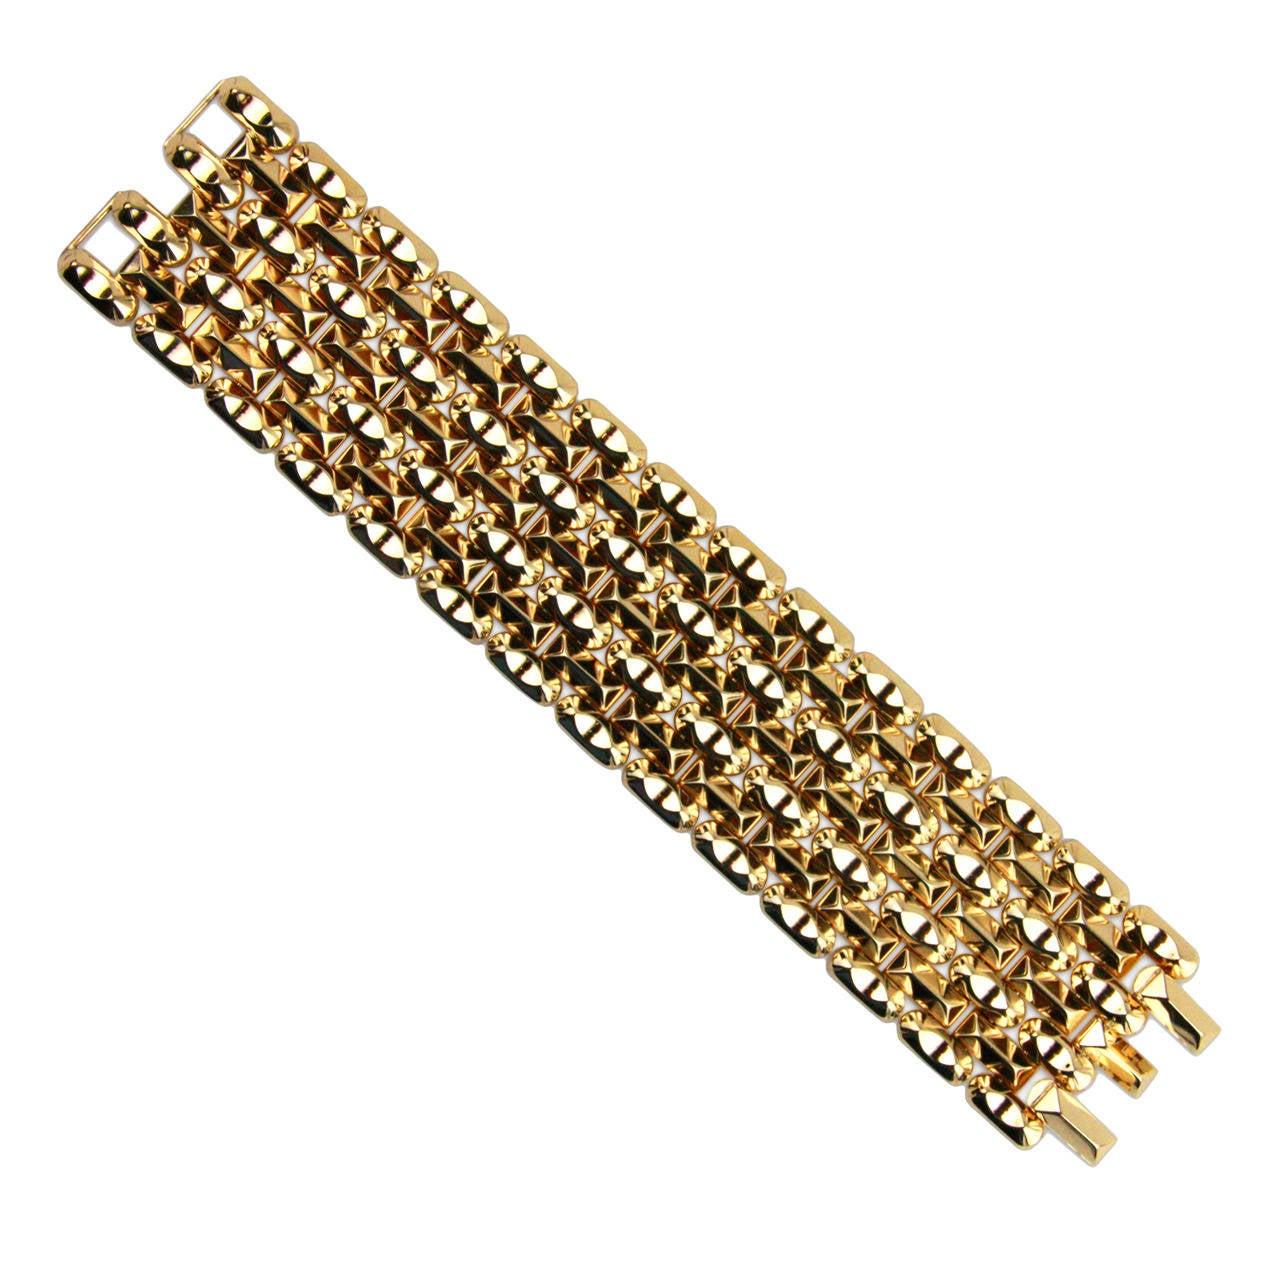 1940s Retro Pink Gold Bracelet For Sale